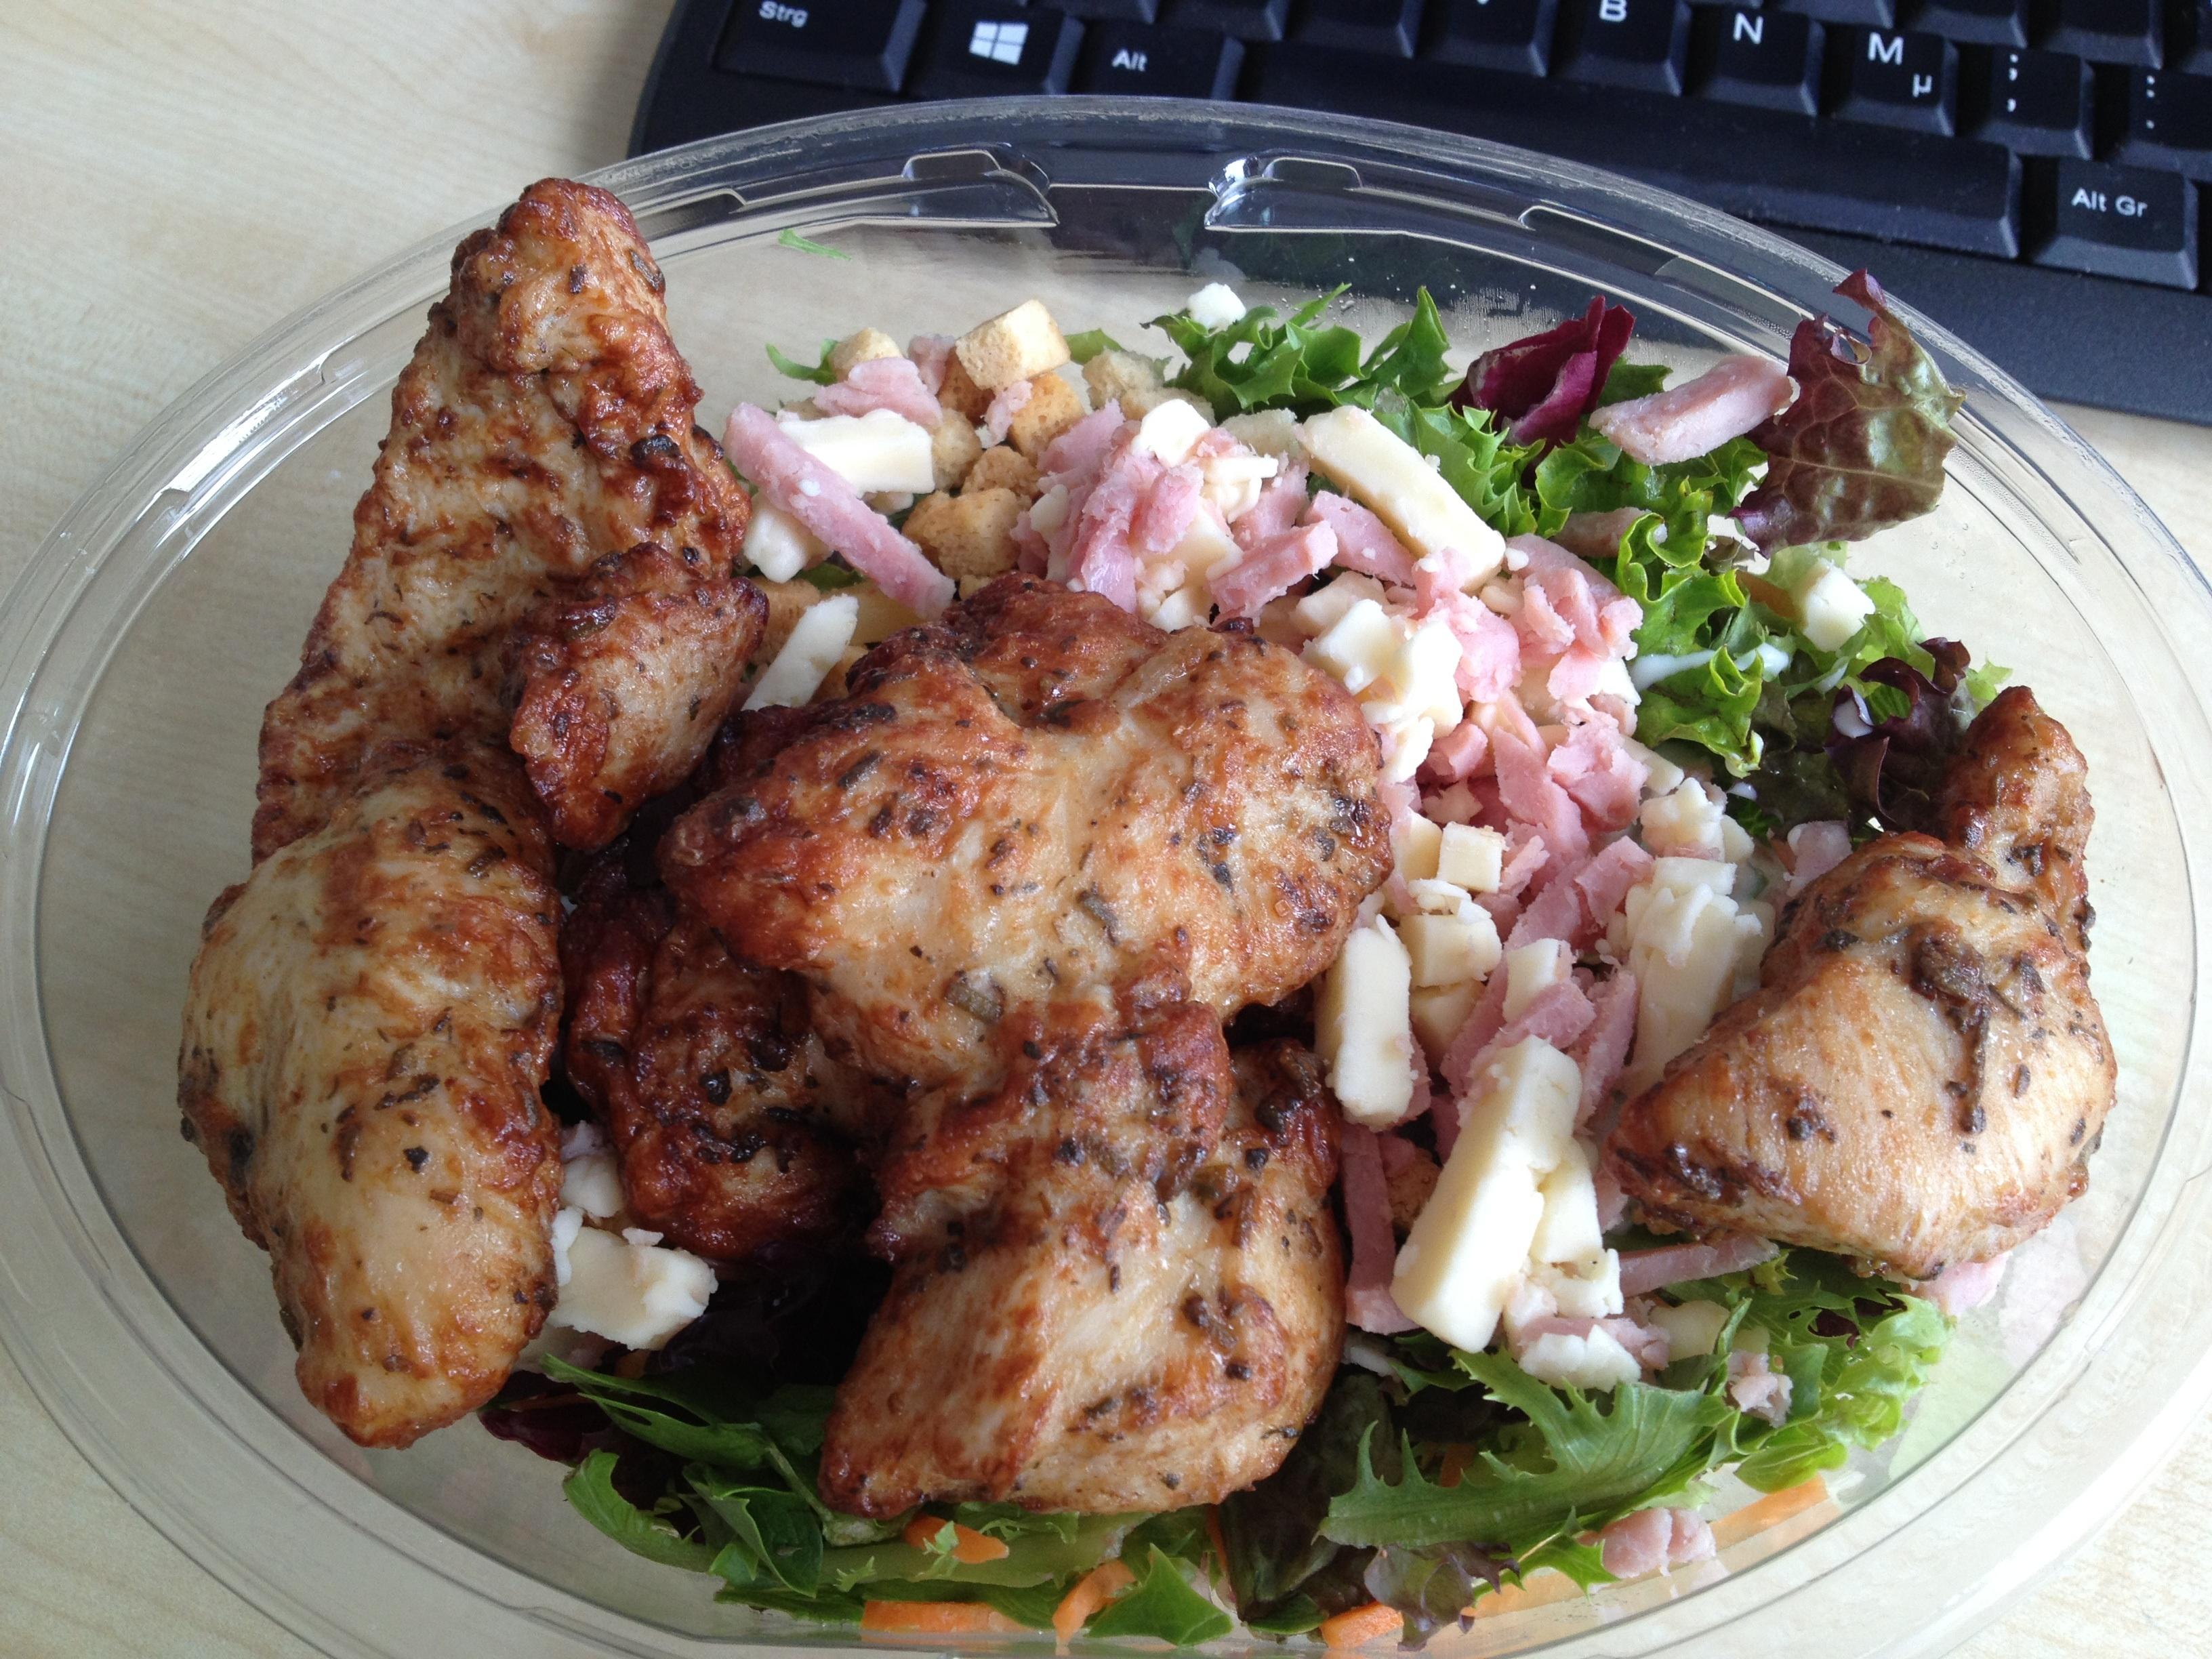 https://foodloader.net/BrollyLSSJ_2013-08-14_Trader_Joe_s_-_Frische_Salate_-_Kaese_&_Schinken_-_Haehnchenbrust-Filetstue.jpg